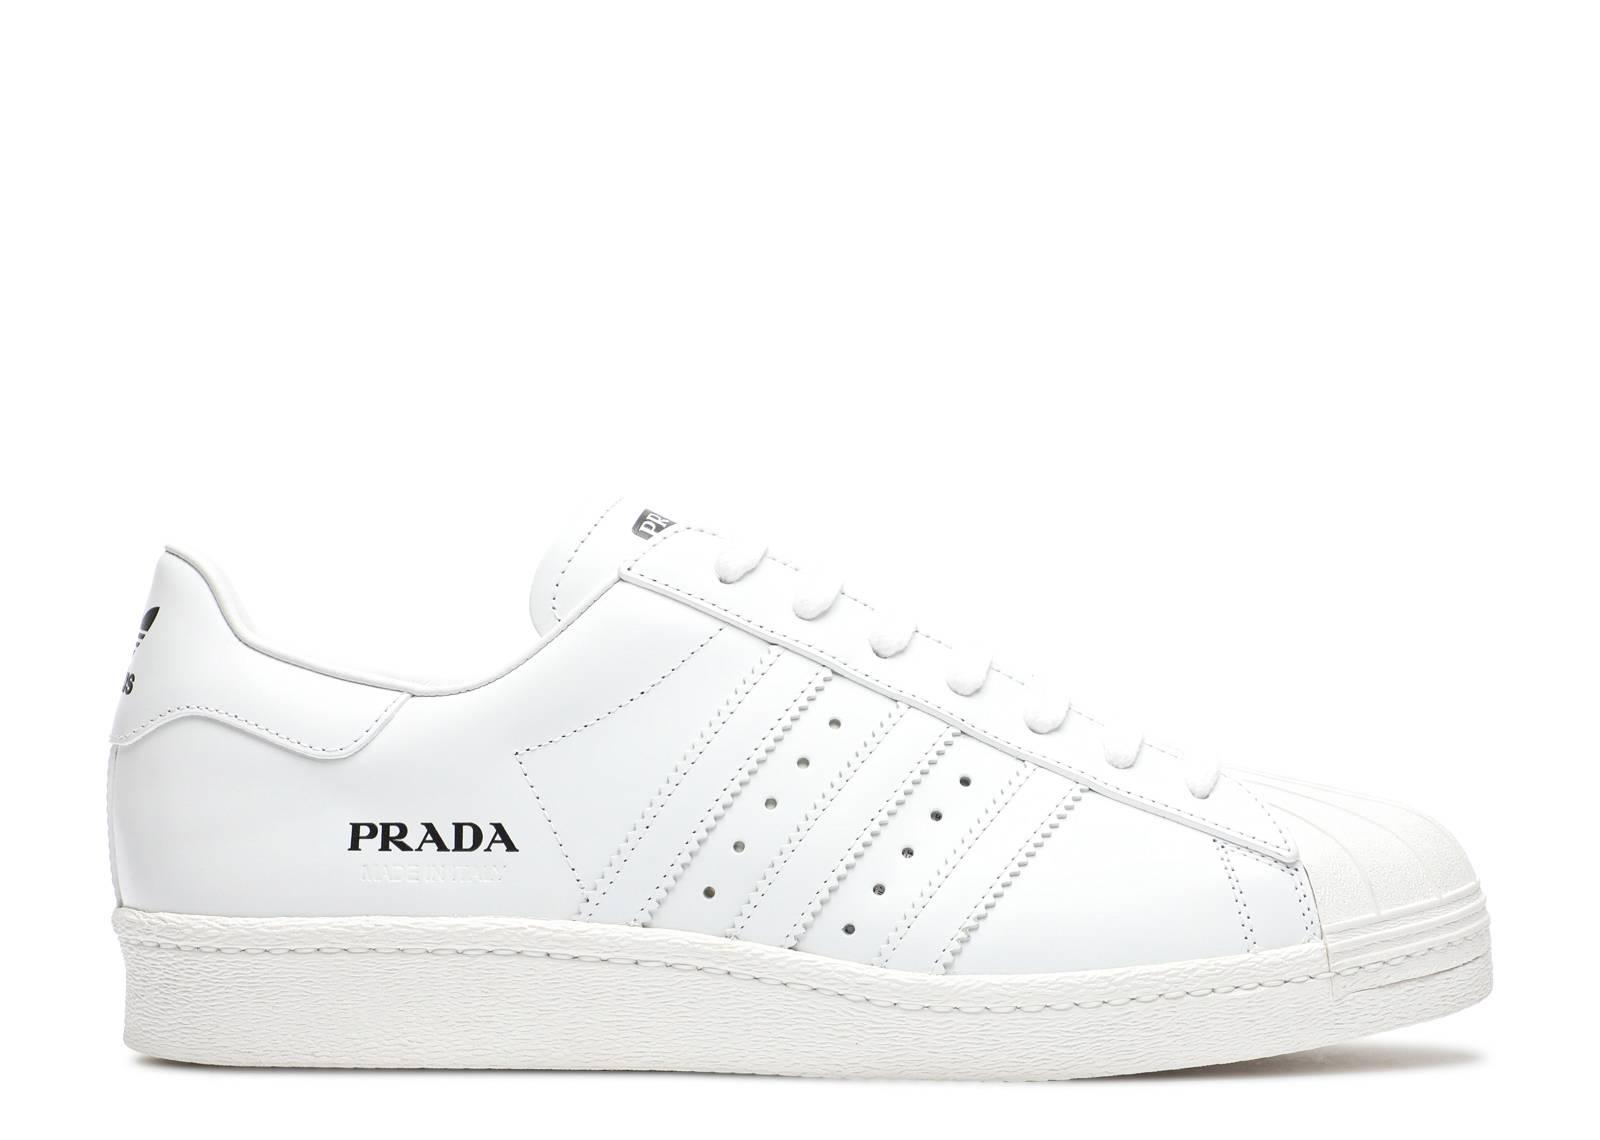 Prada x Superstar 'Core White' Adidas Release